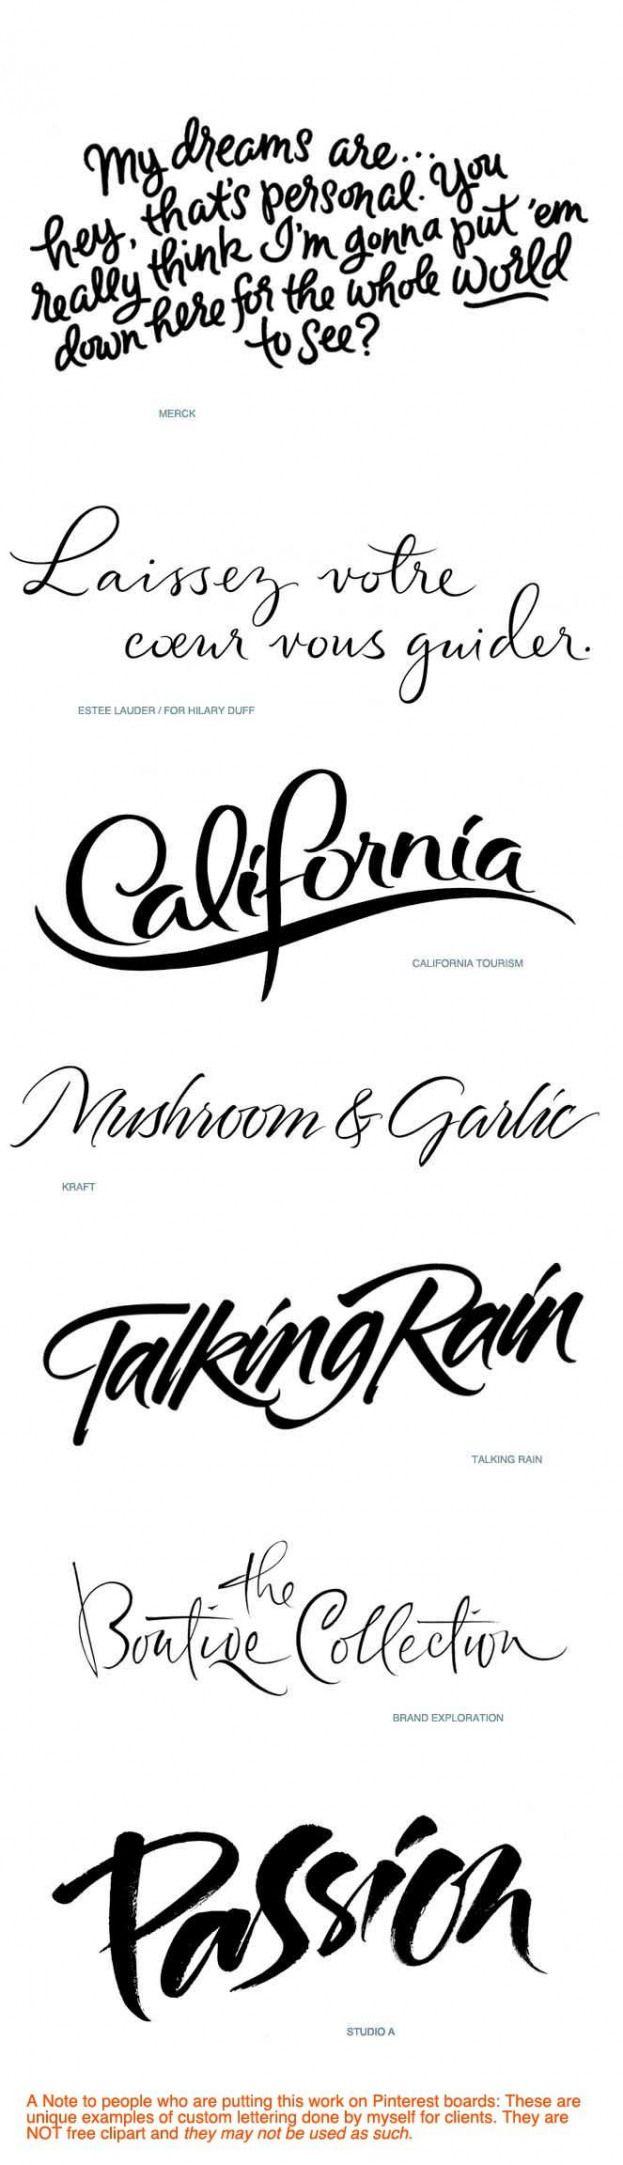 Bram Johnson, Lafayette, Adobe Illustrator, Adobe